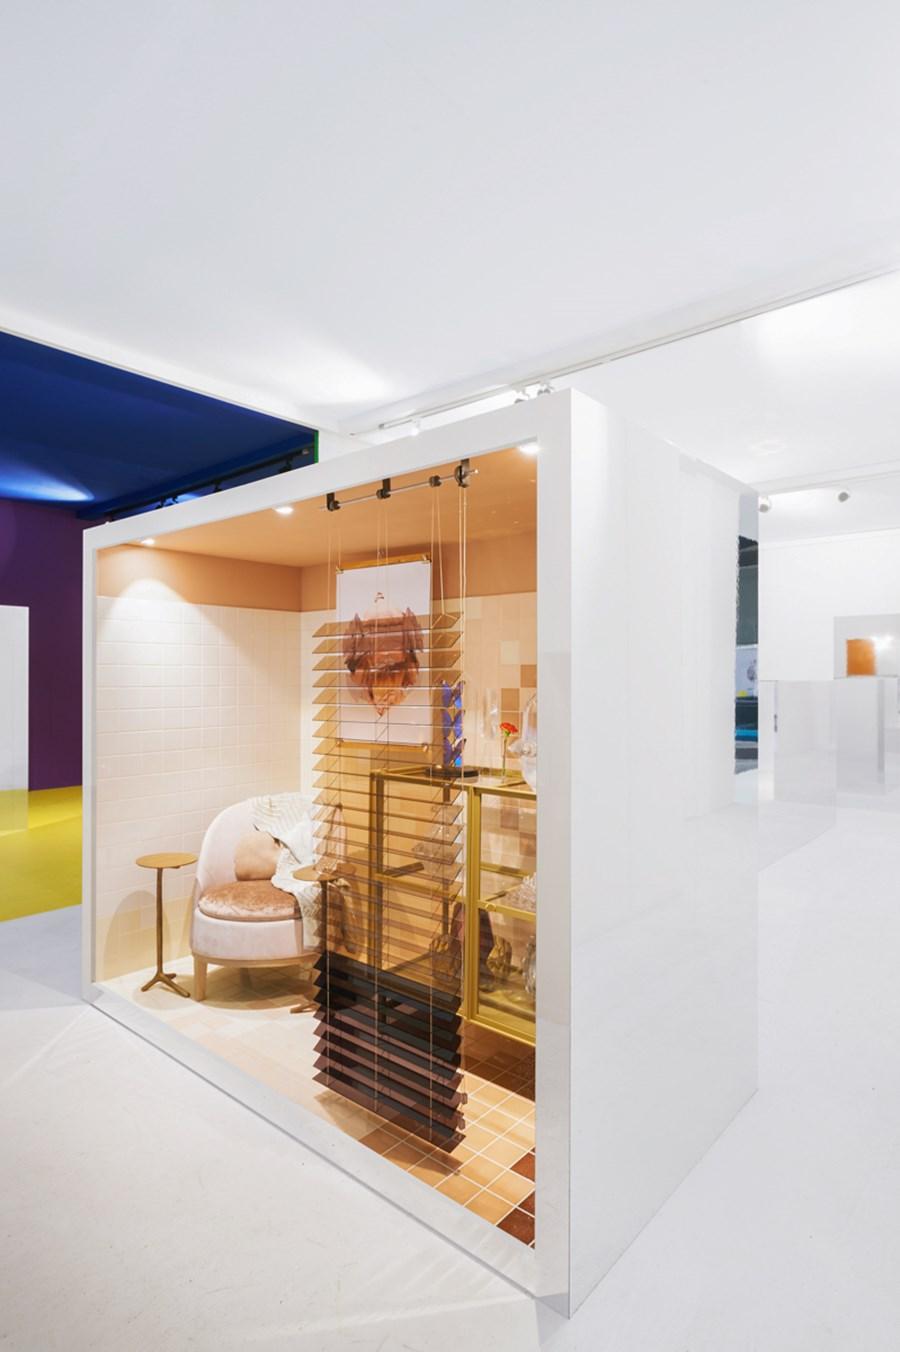 EH&I pavilion 2015 by i29 interior architects 12